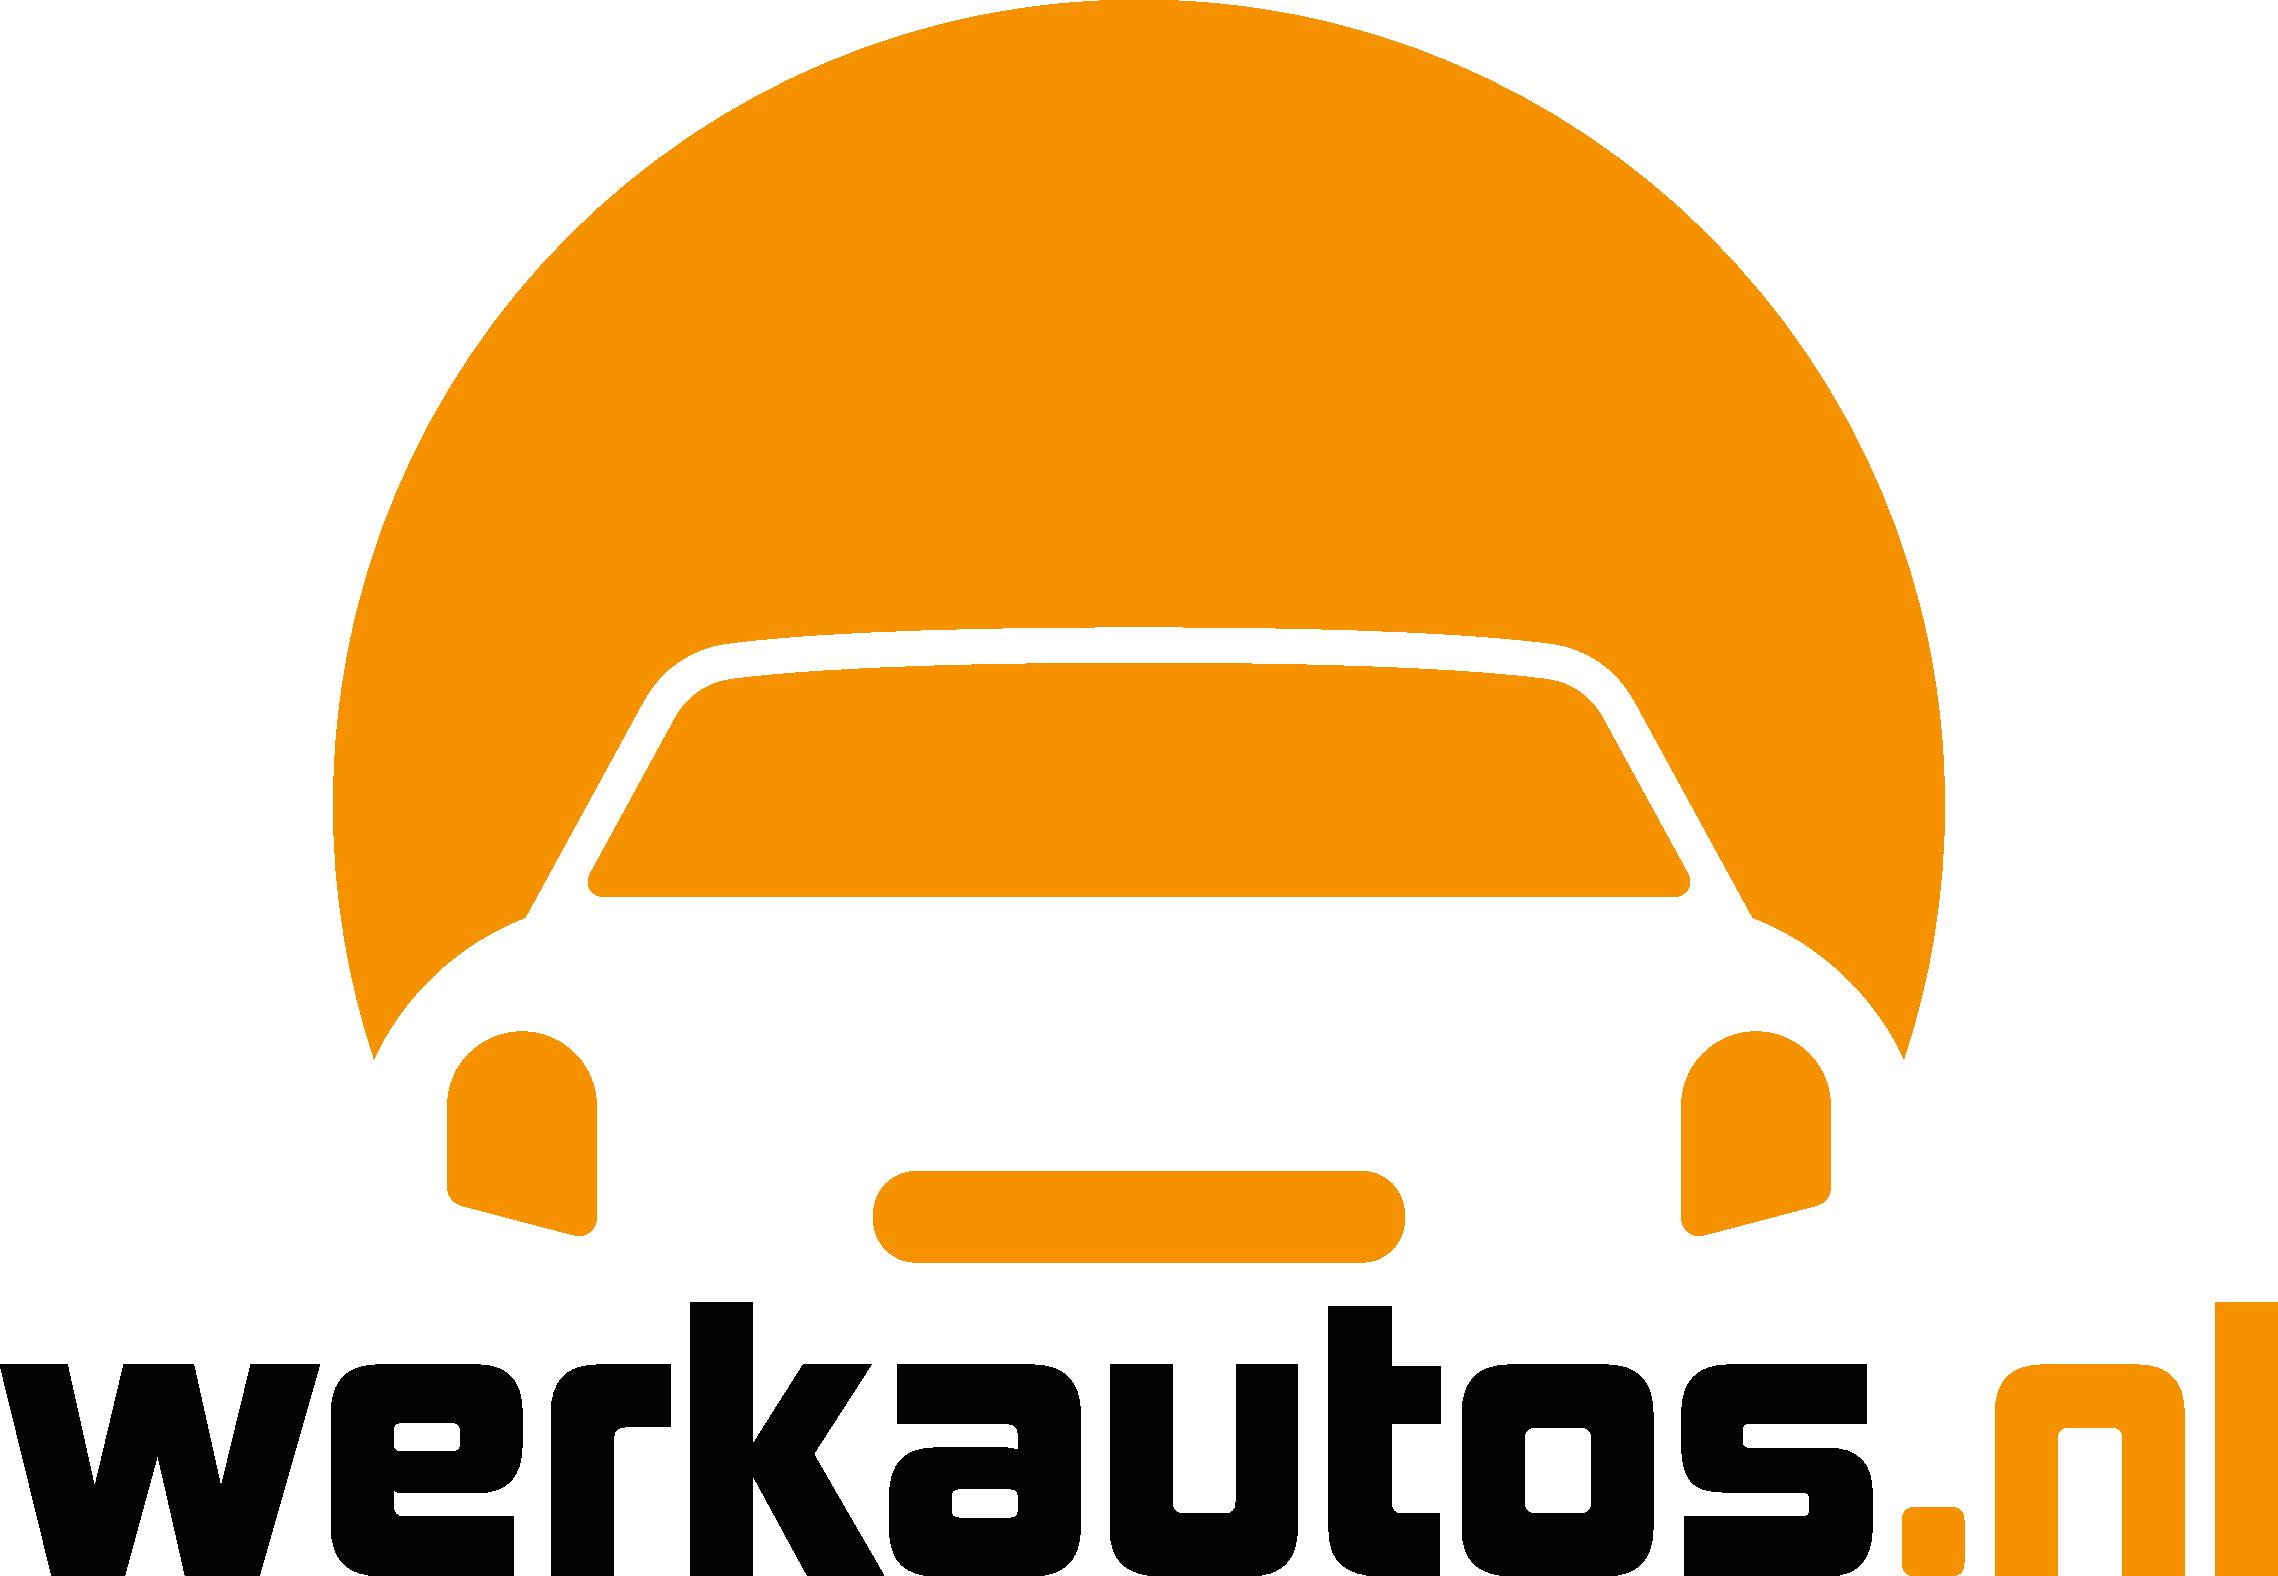 Dealer Werkautos.nl